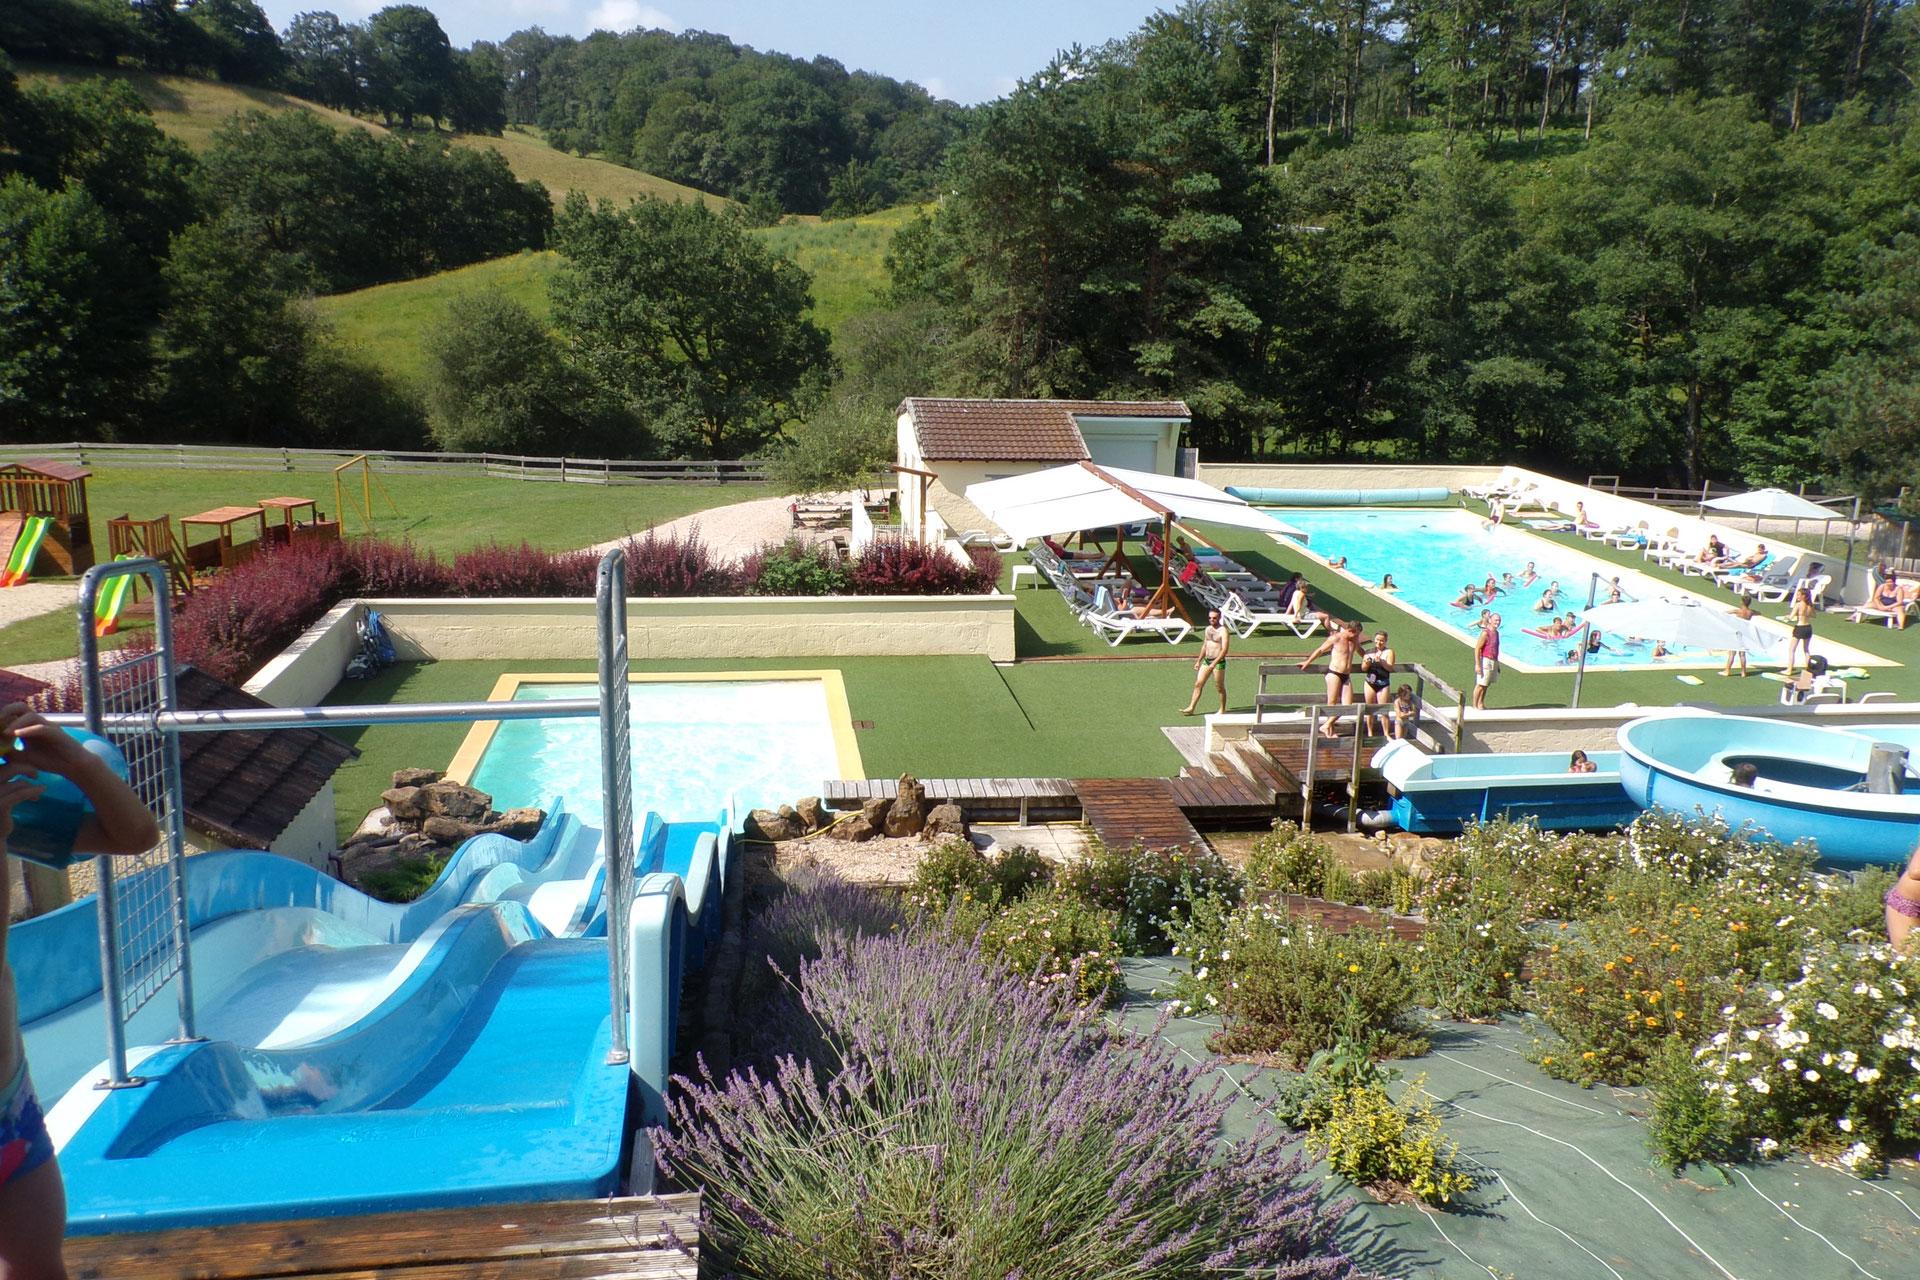 Camping les trois piscine chauff e toboggans for Camping a la ferme dordogne piscine